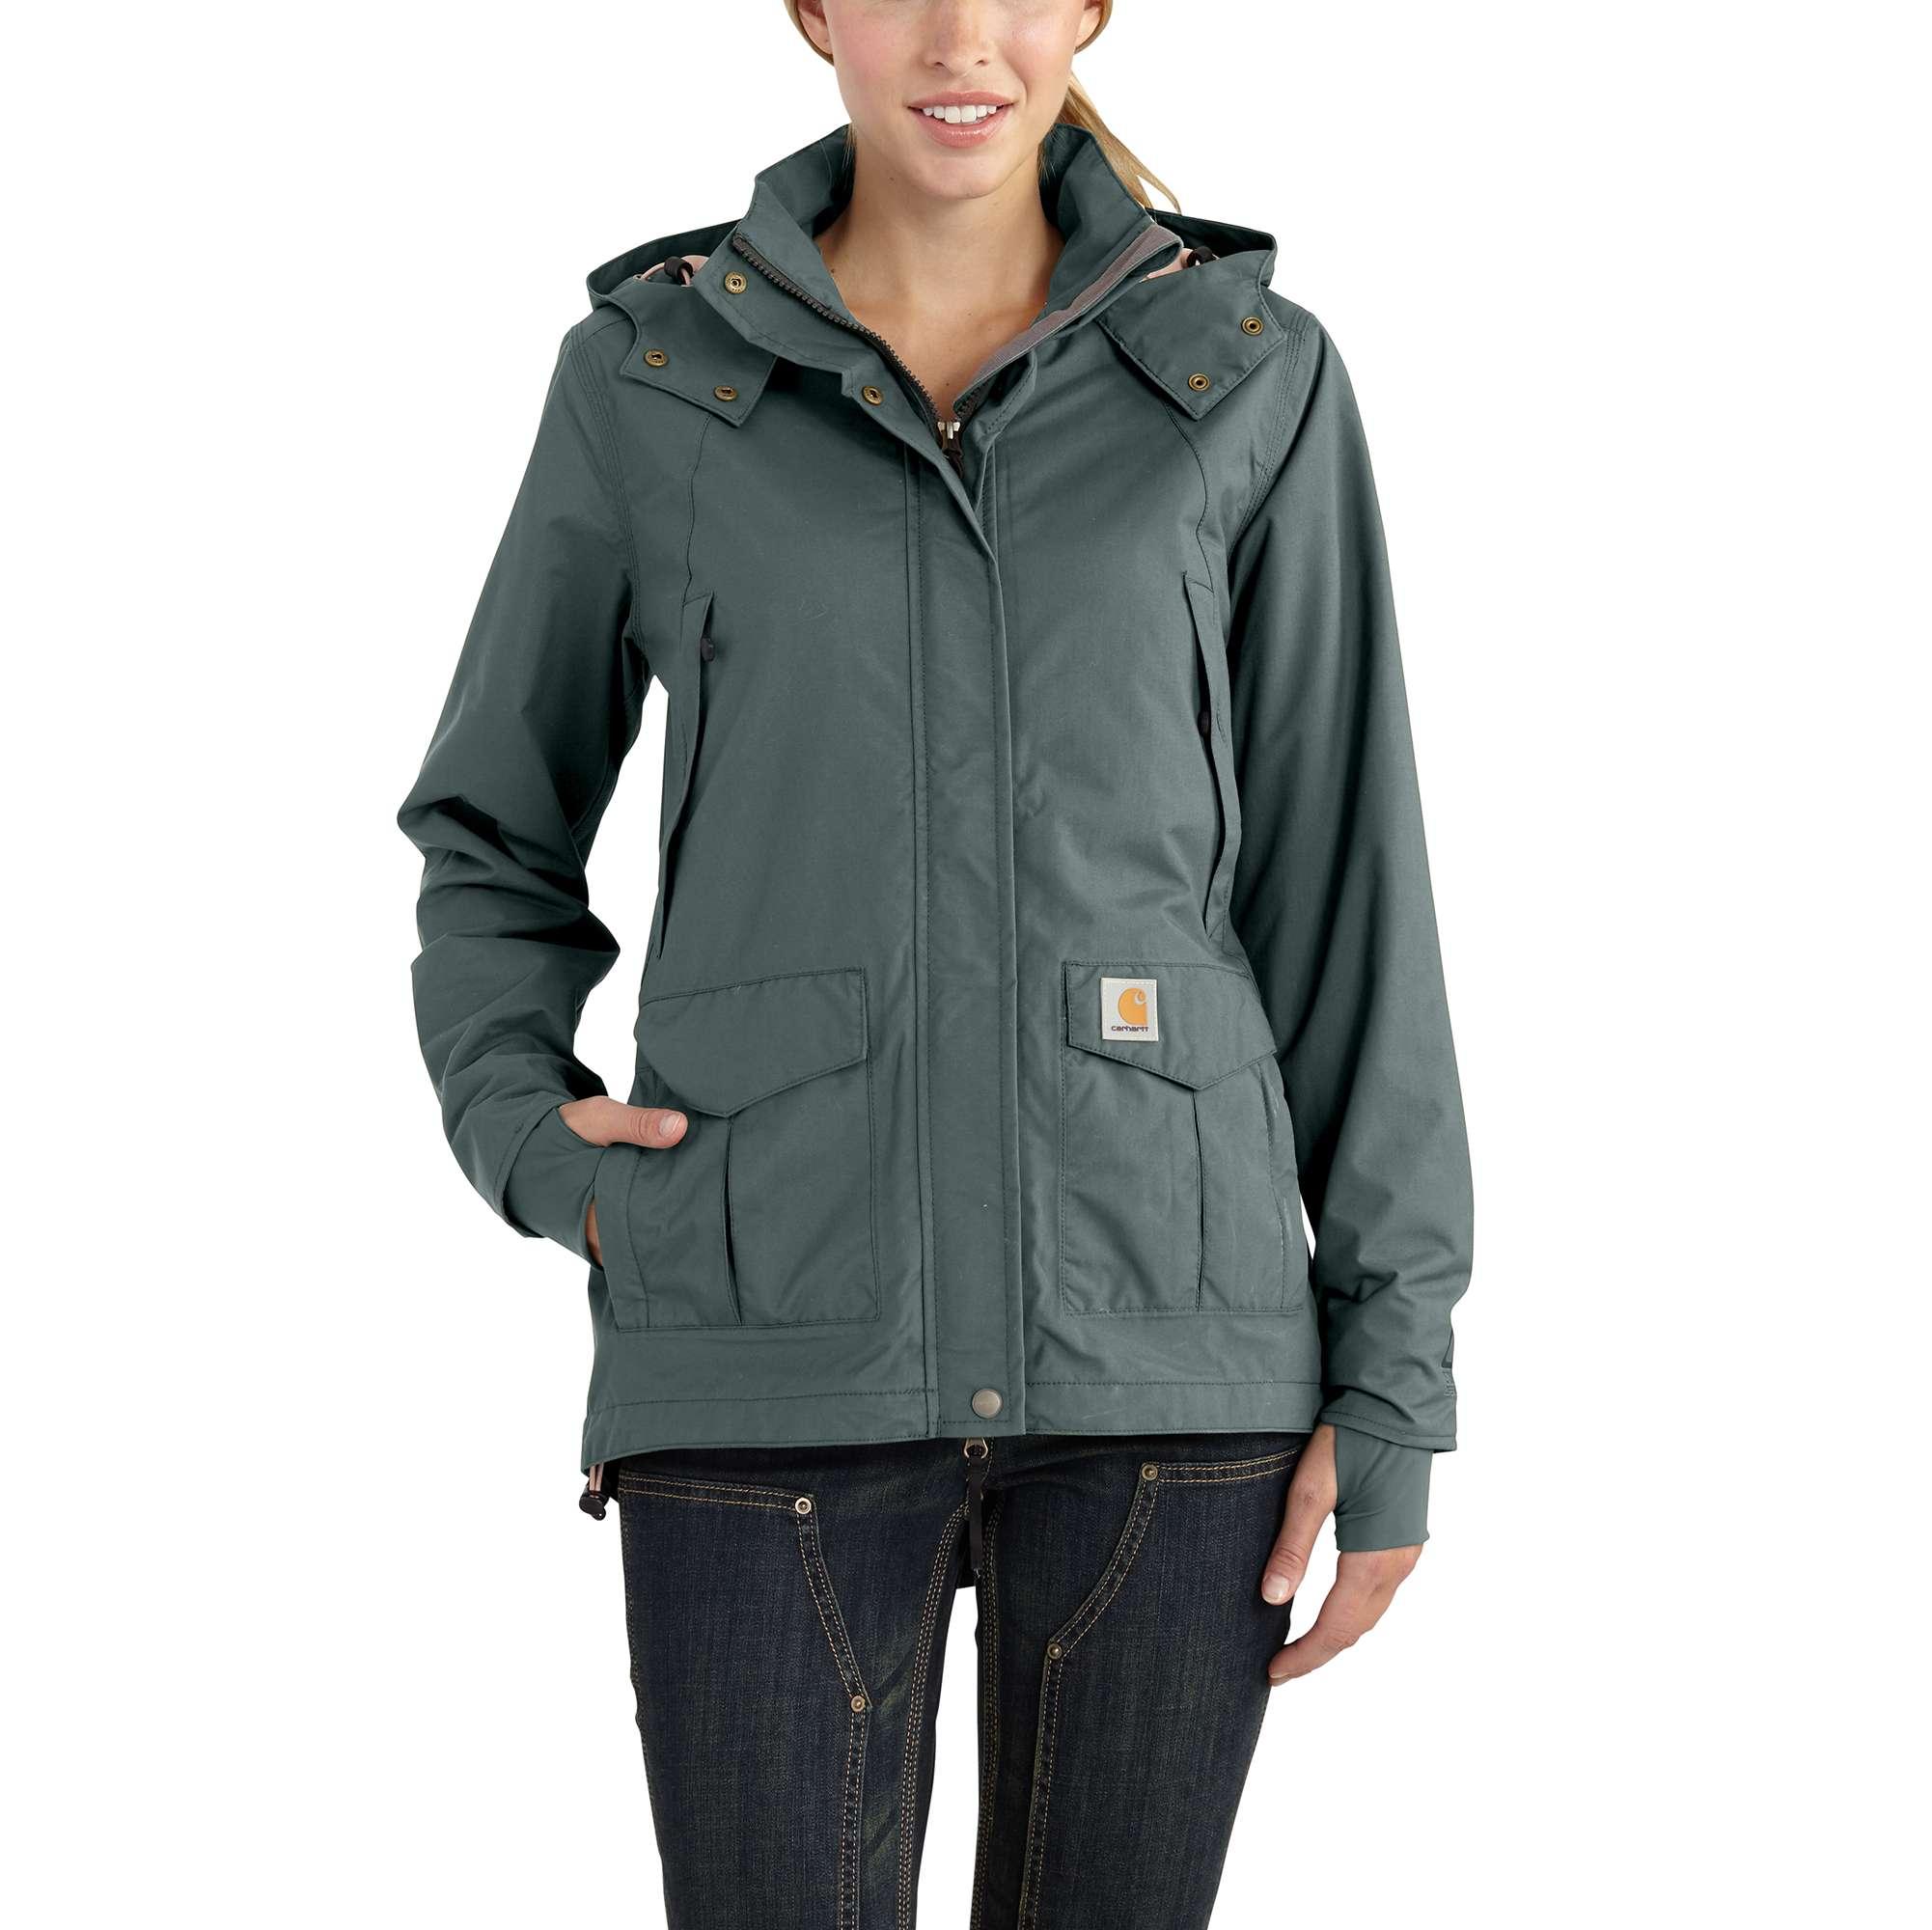 Carhartt Women's Shoreline Jacket Size: LG